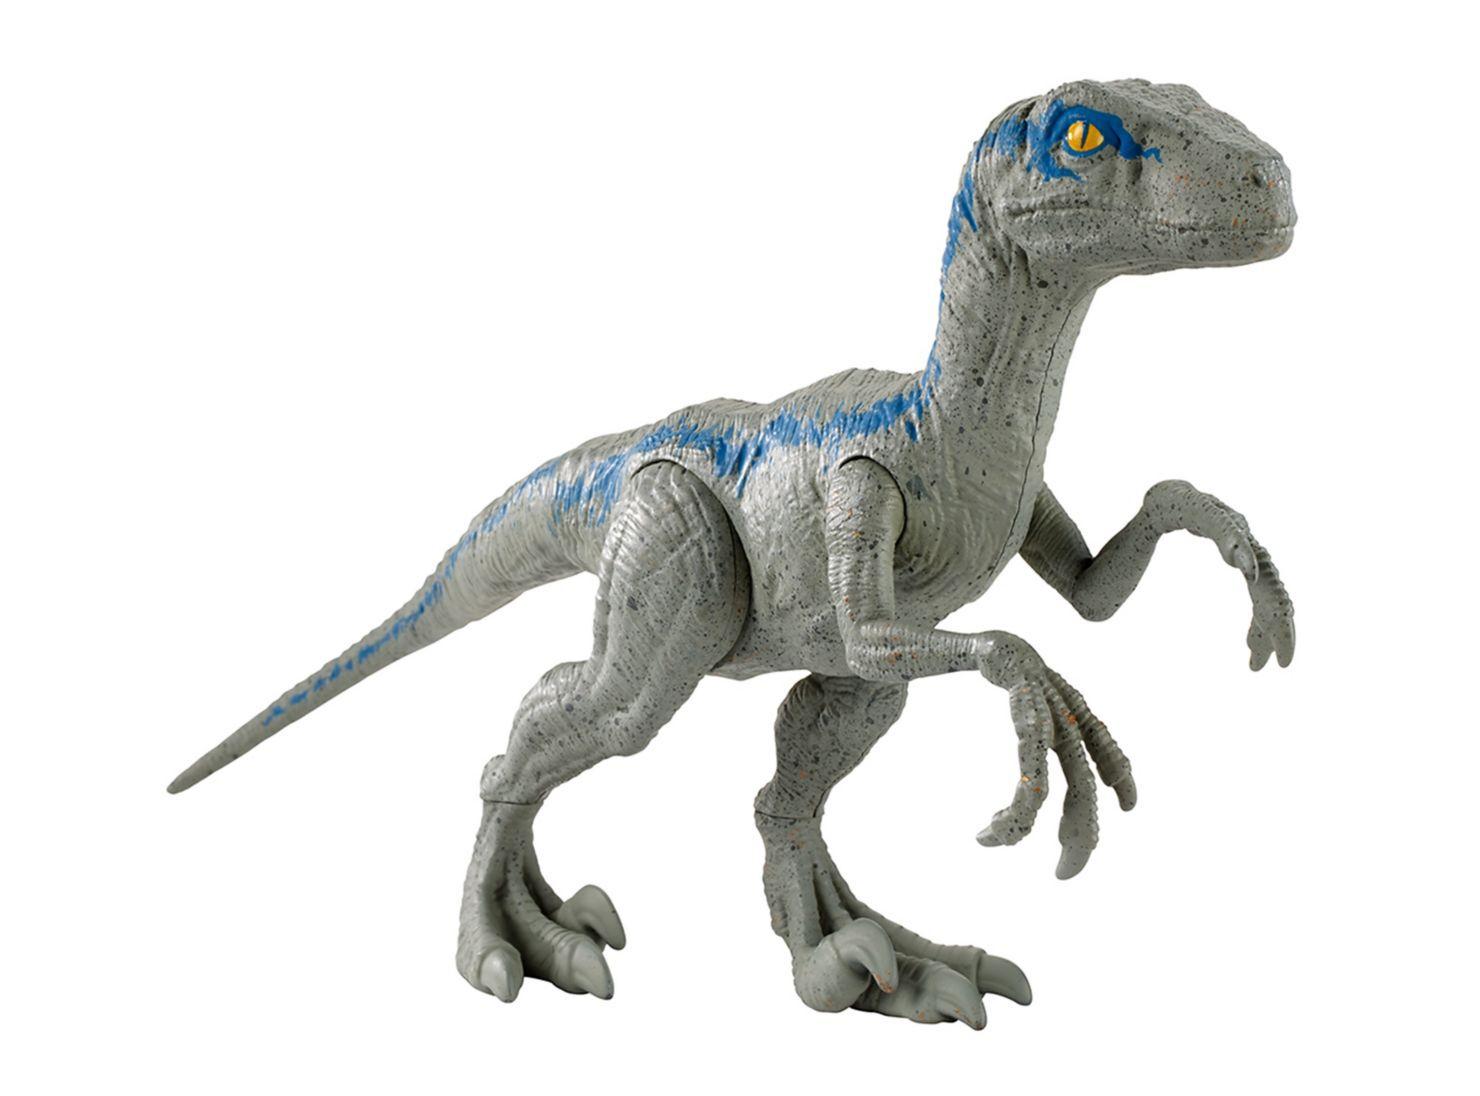 Dinosaurio Velociraptor Blue Jurassic World Juegos De Accion Paris Cl Velociraptor (ve·loc·i·rap·tor) (swift seizer or thief) was a small carnivorous dinosaur, well known thanks to jurassic park. dinosaurio velociraptor blue jurassic world